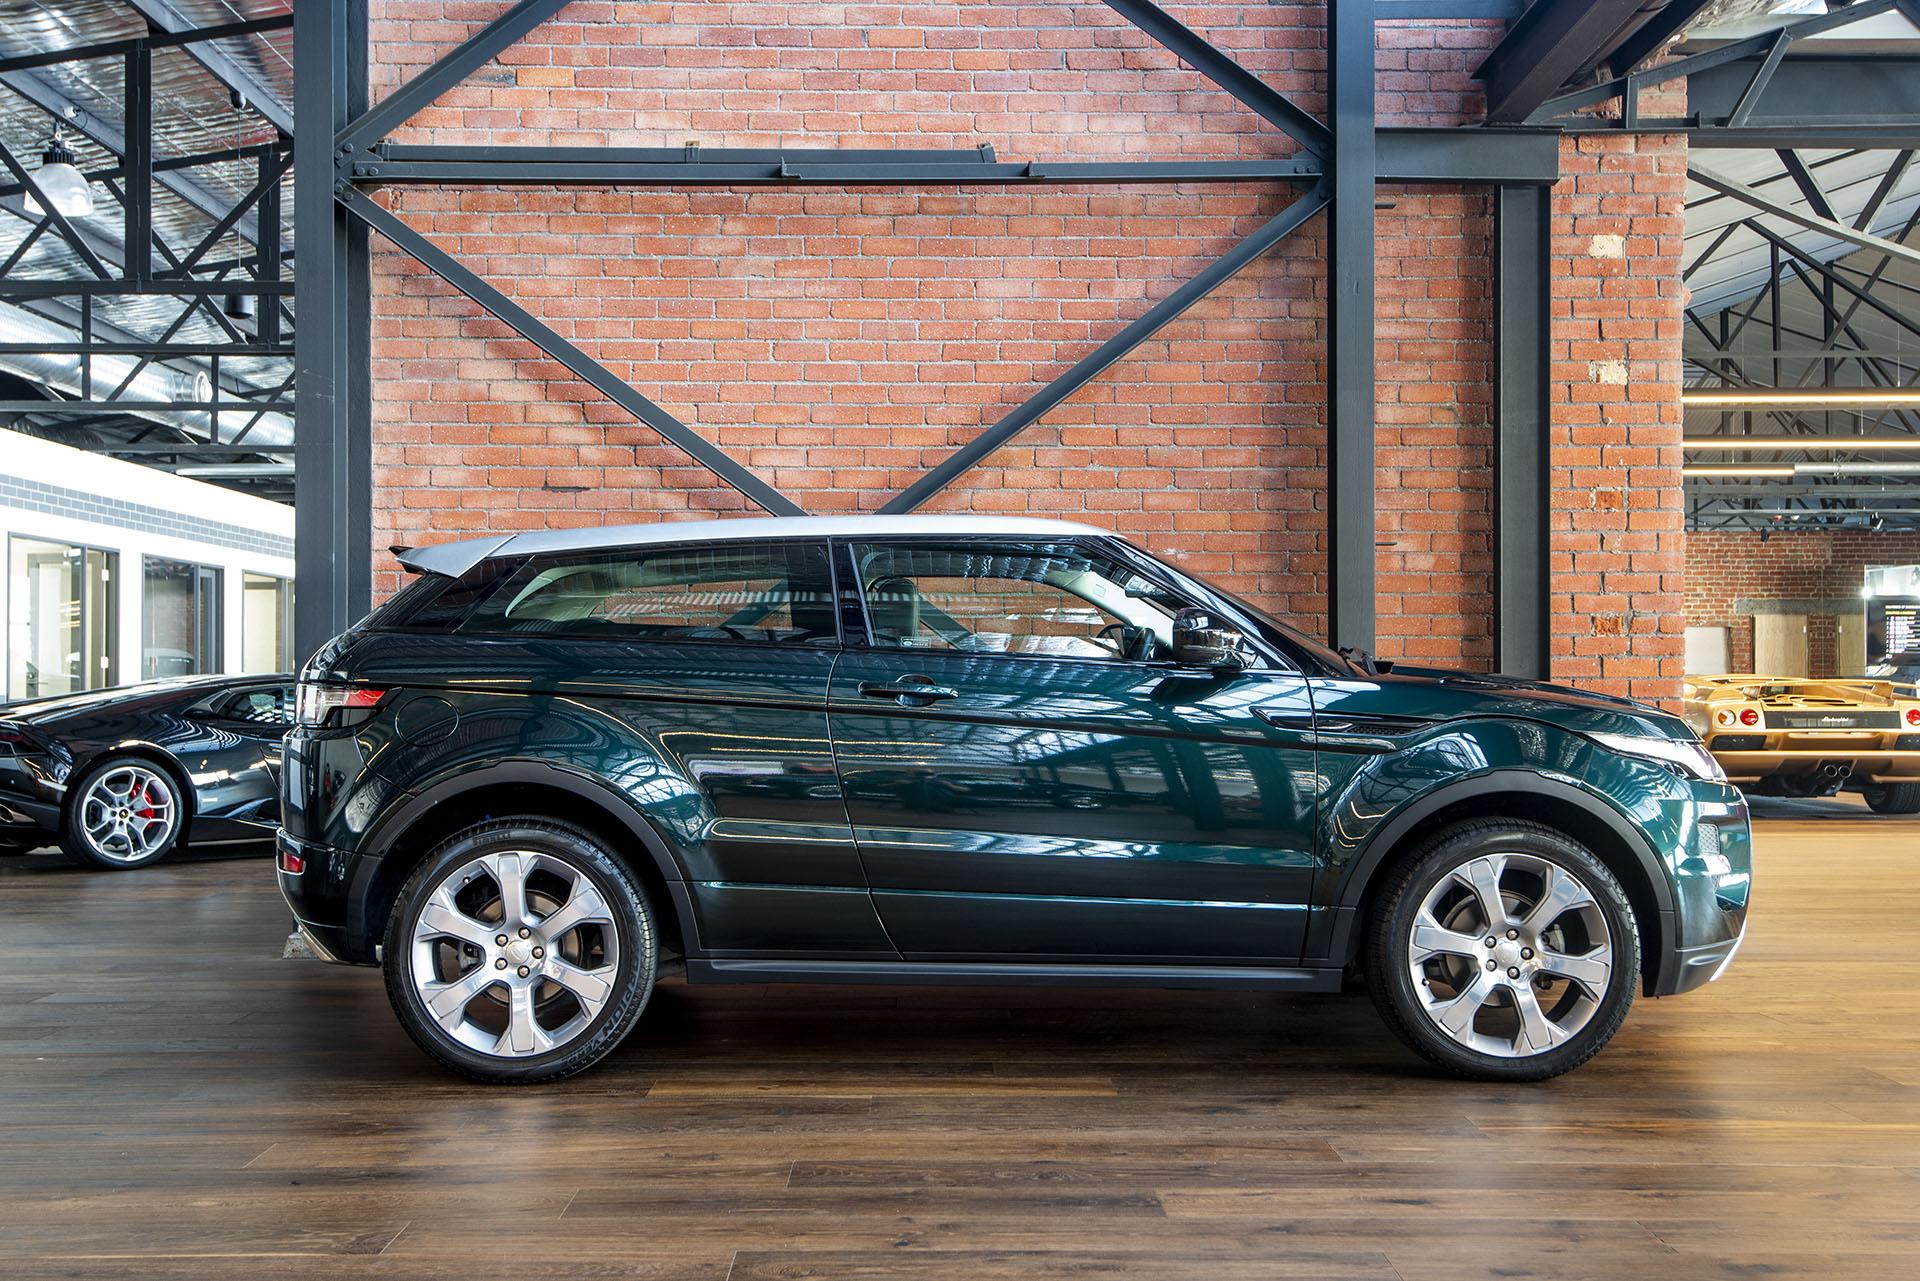 Range Rover Evoke >> 2014 Land Rover Range Rover Evoque Coupe - Richmonds - Classic and Prestige Cars - Storage and ...